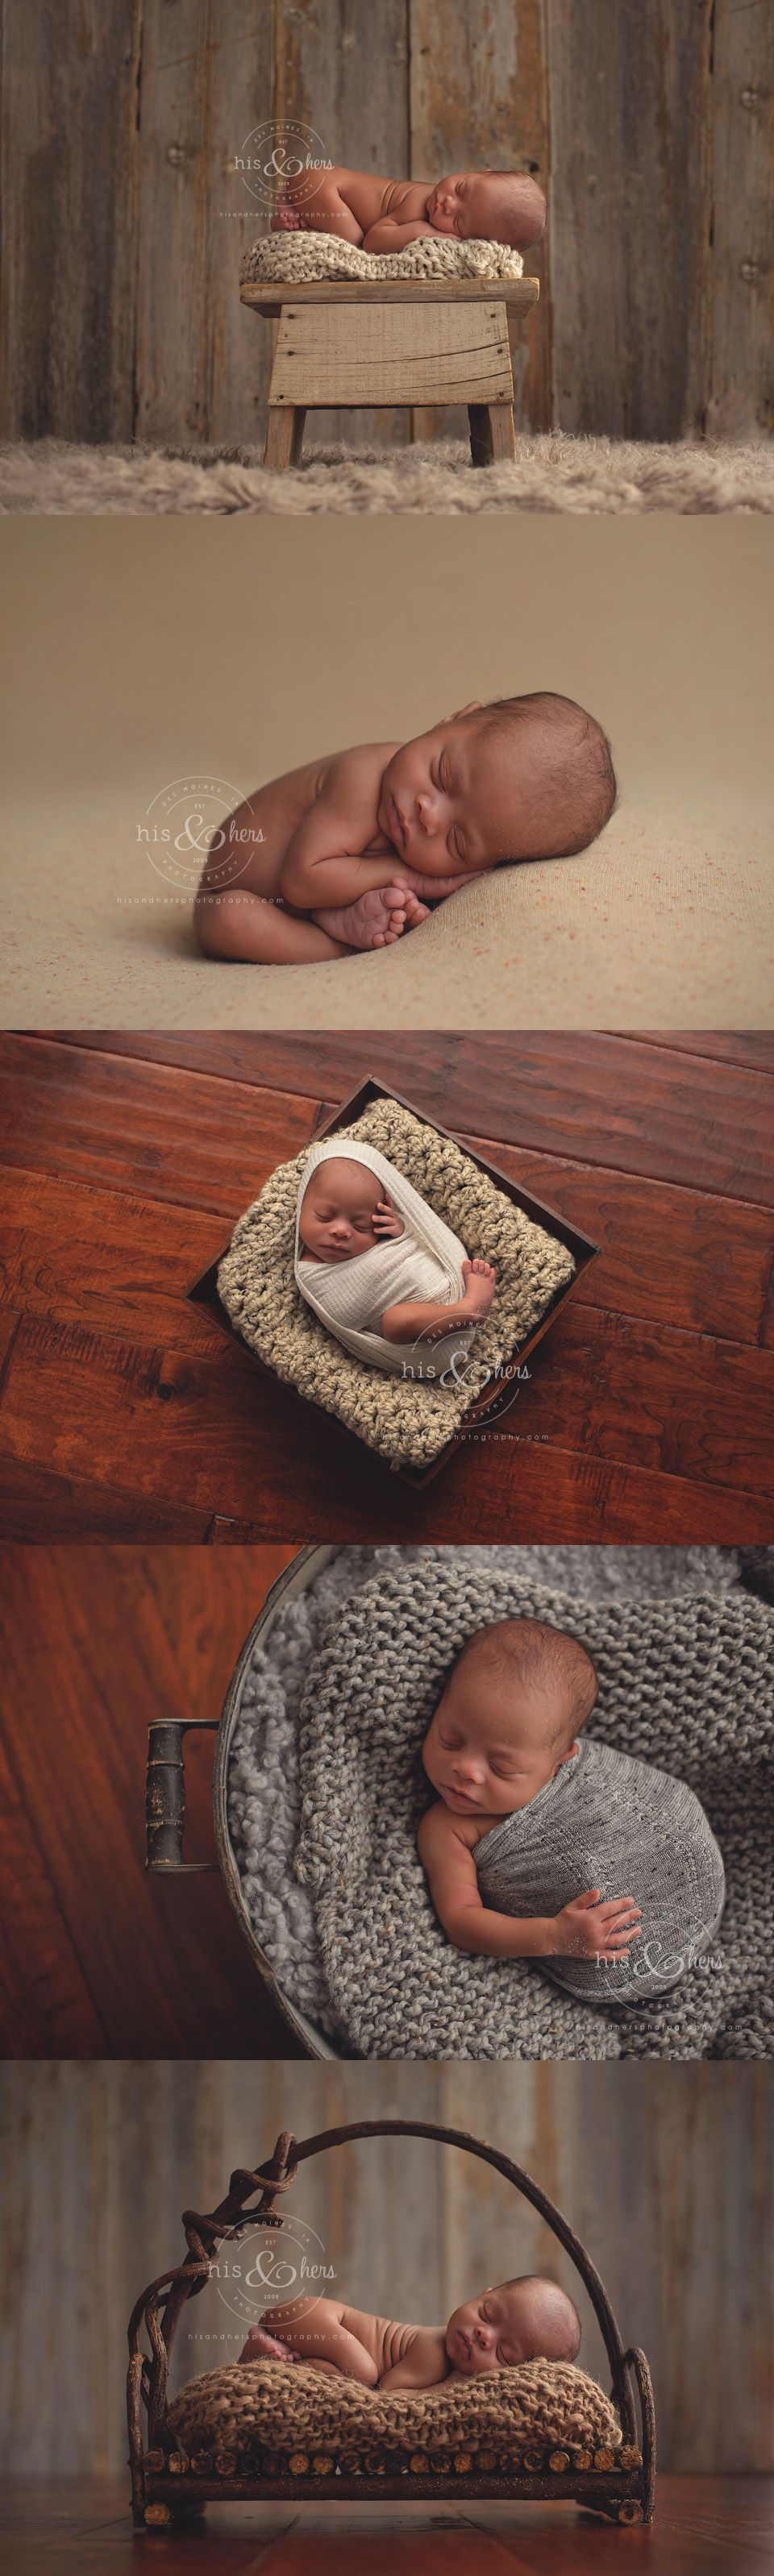 iowa newborn photographer new baby  pictures portraits photography studio des moines iowa